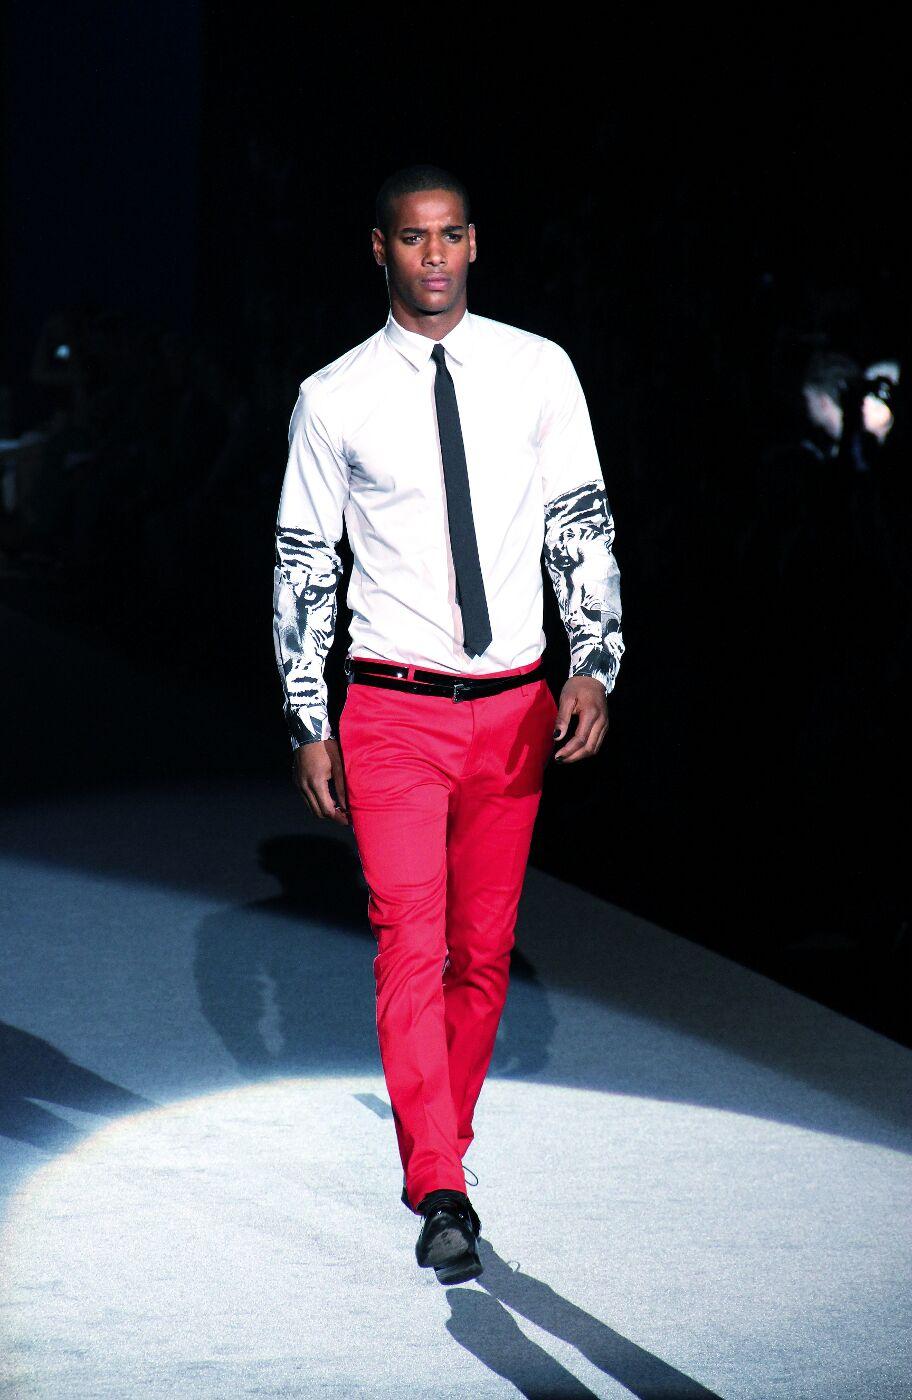 dsquared2-spring-summer-2012-men-collection-milano-fashion-week-2012-dsquared2-primavera-estate-catwalk-2012